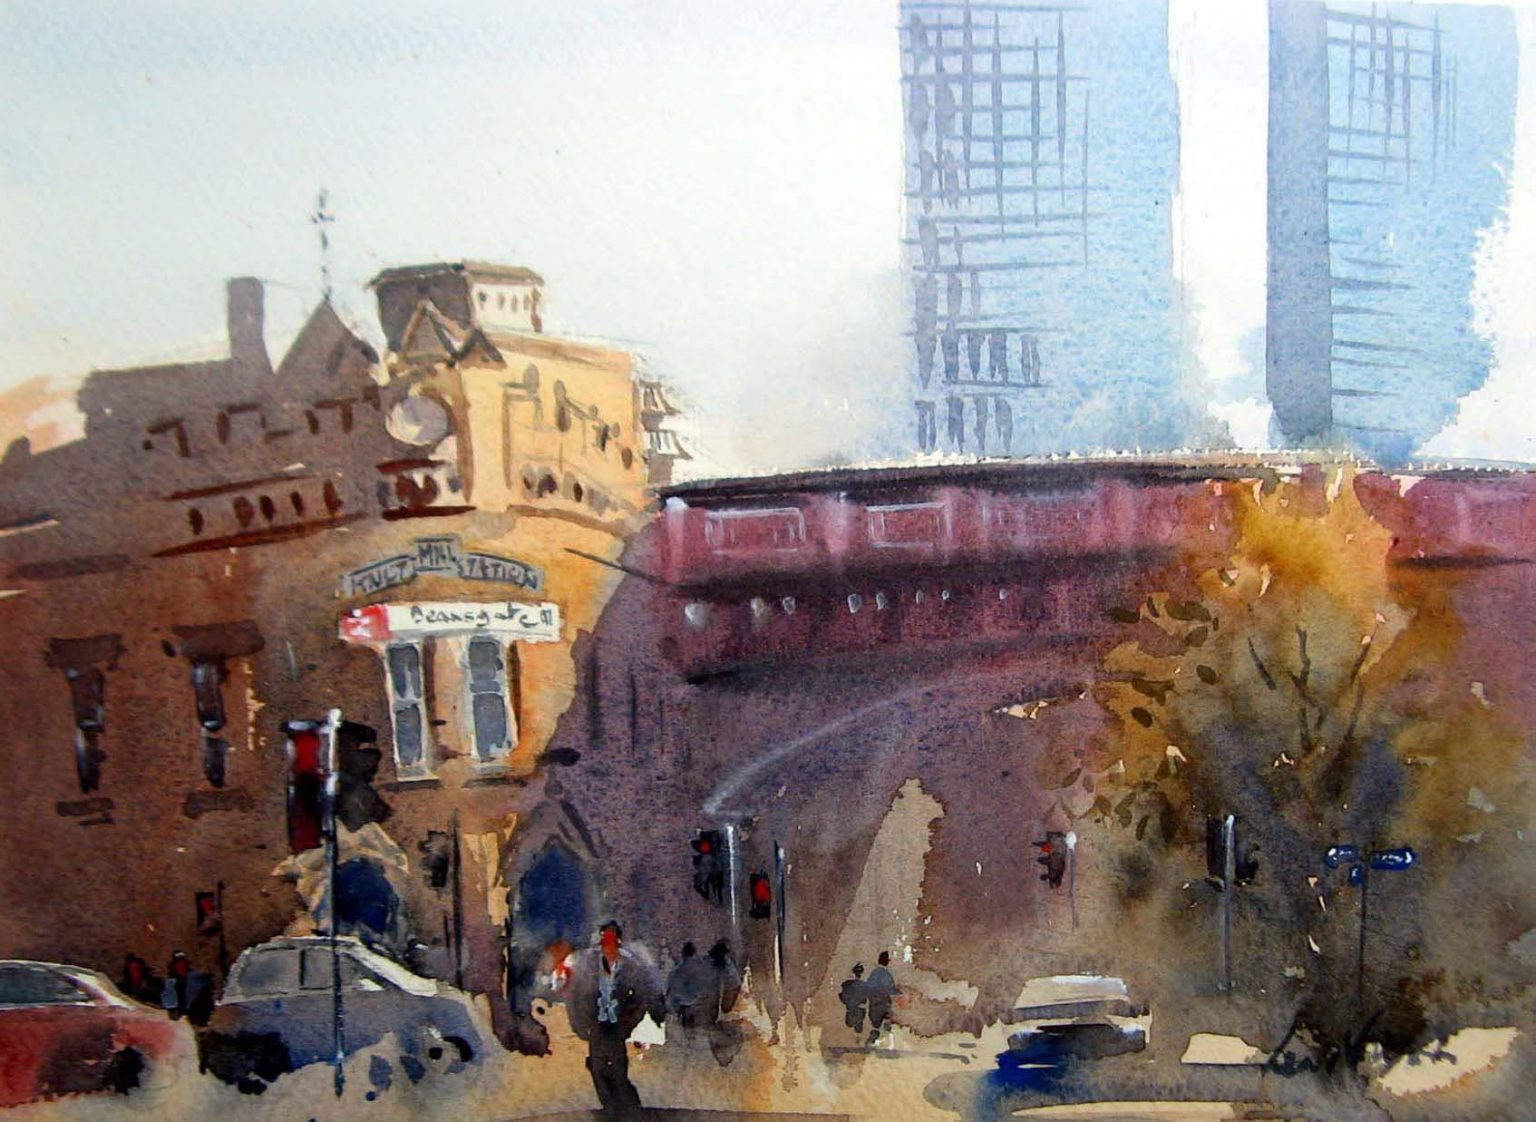 Deansgate Station, Manchester